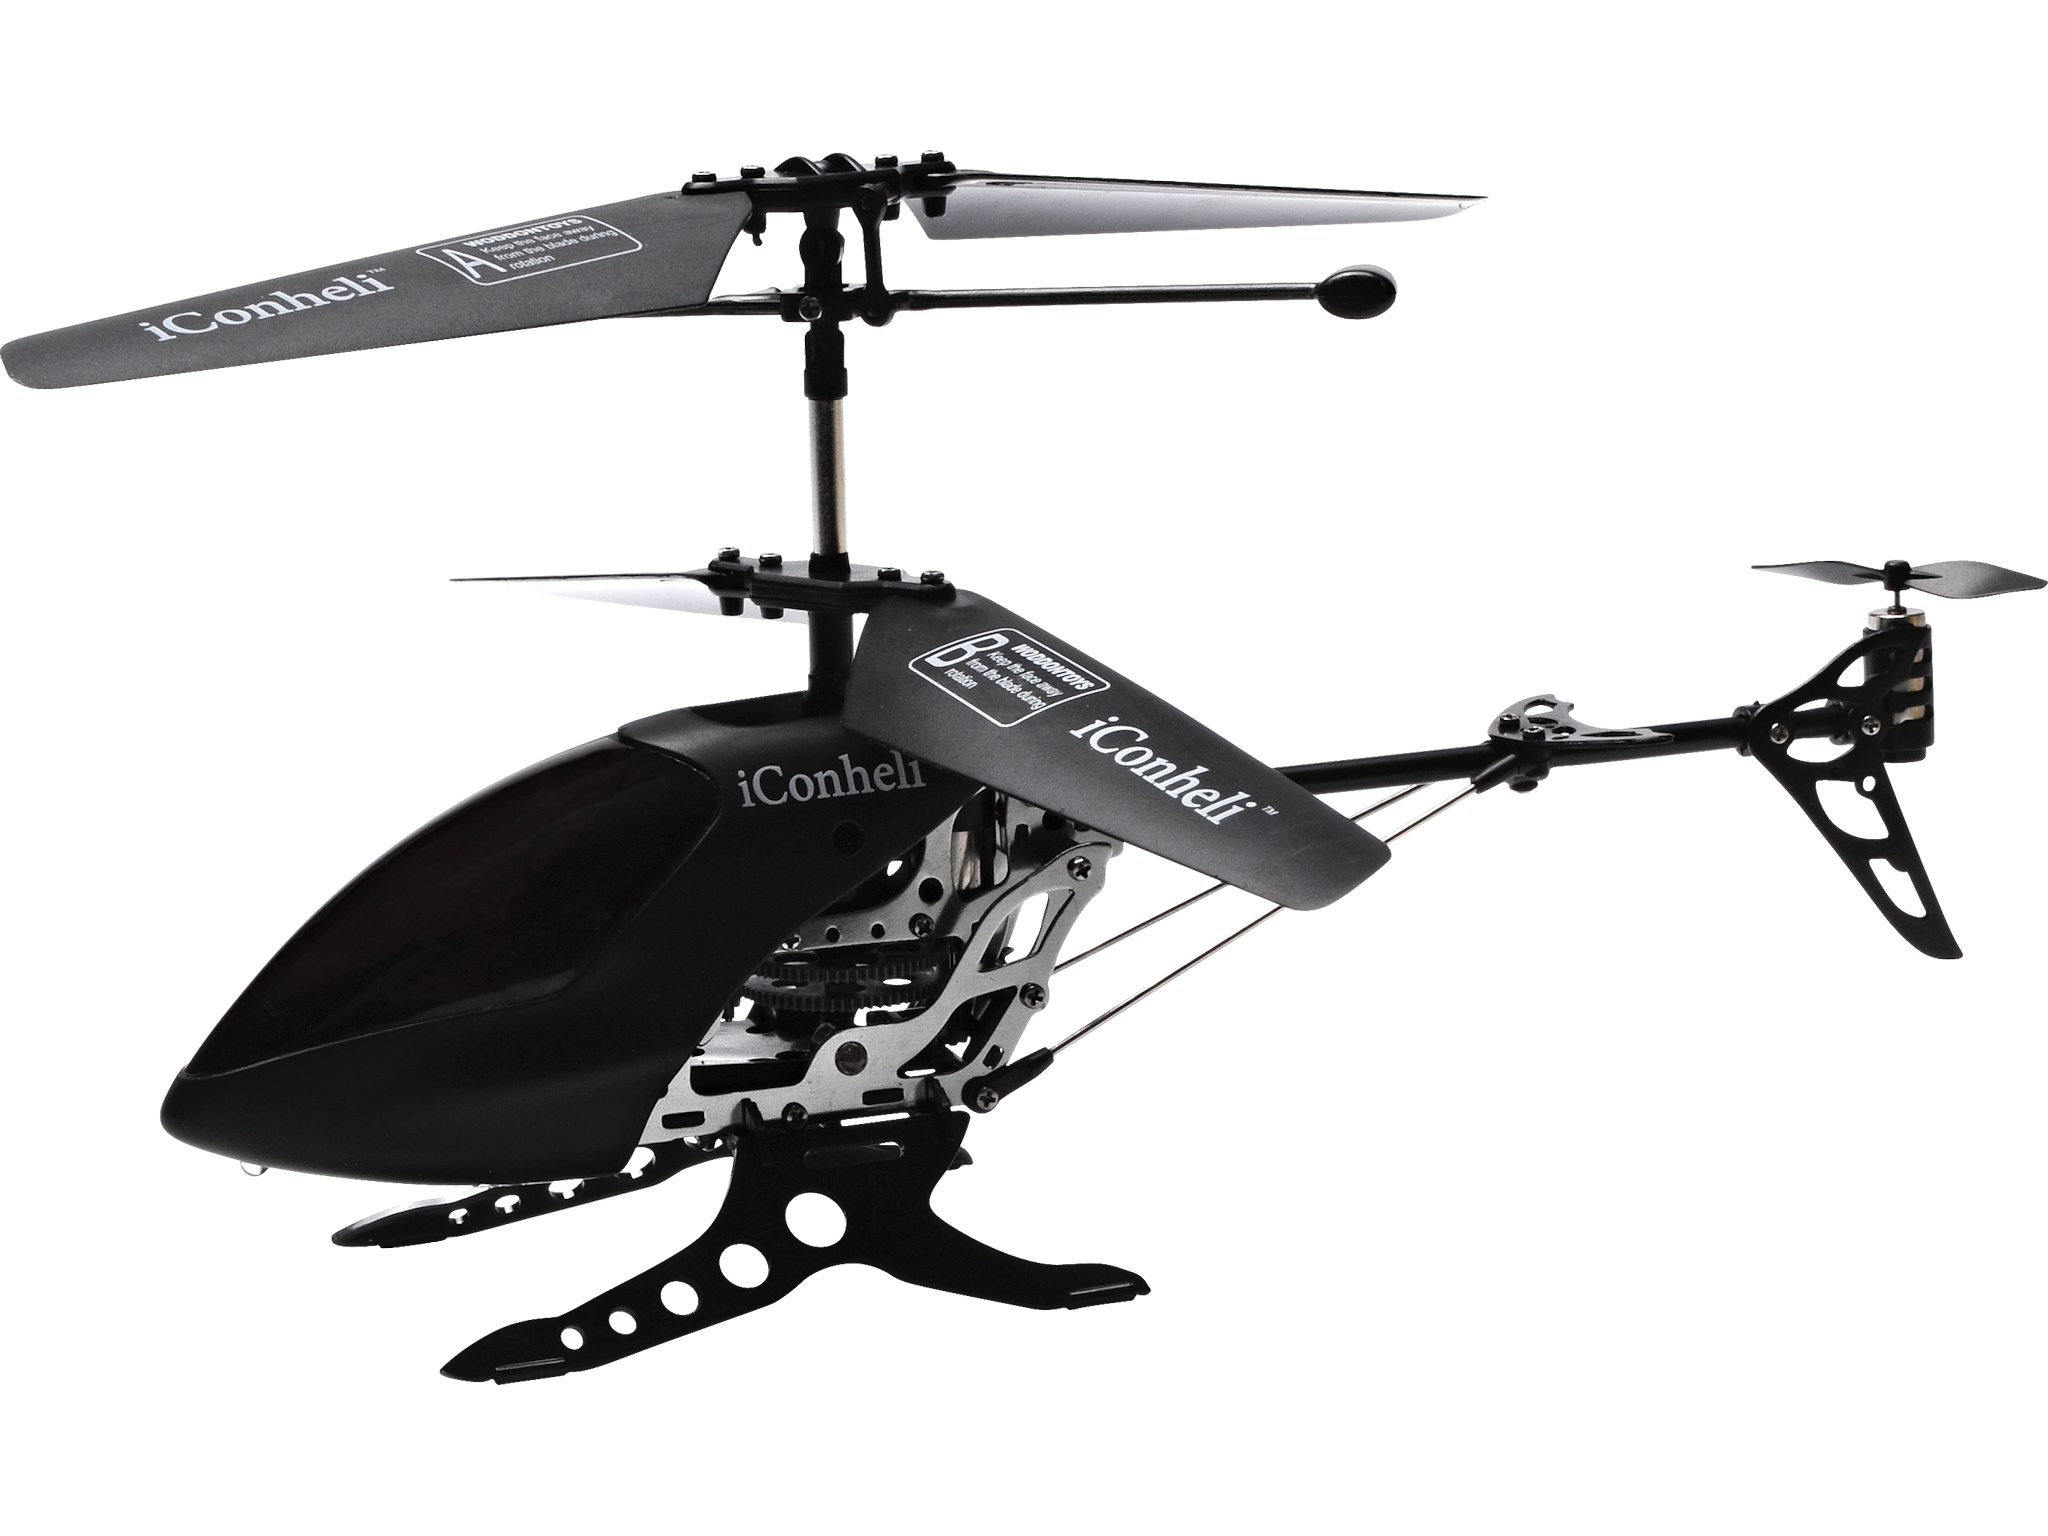 iConheli Bluetooth Helicopter